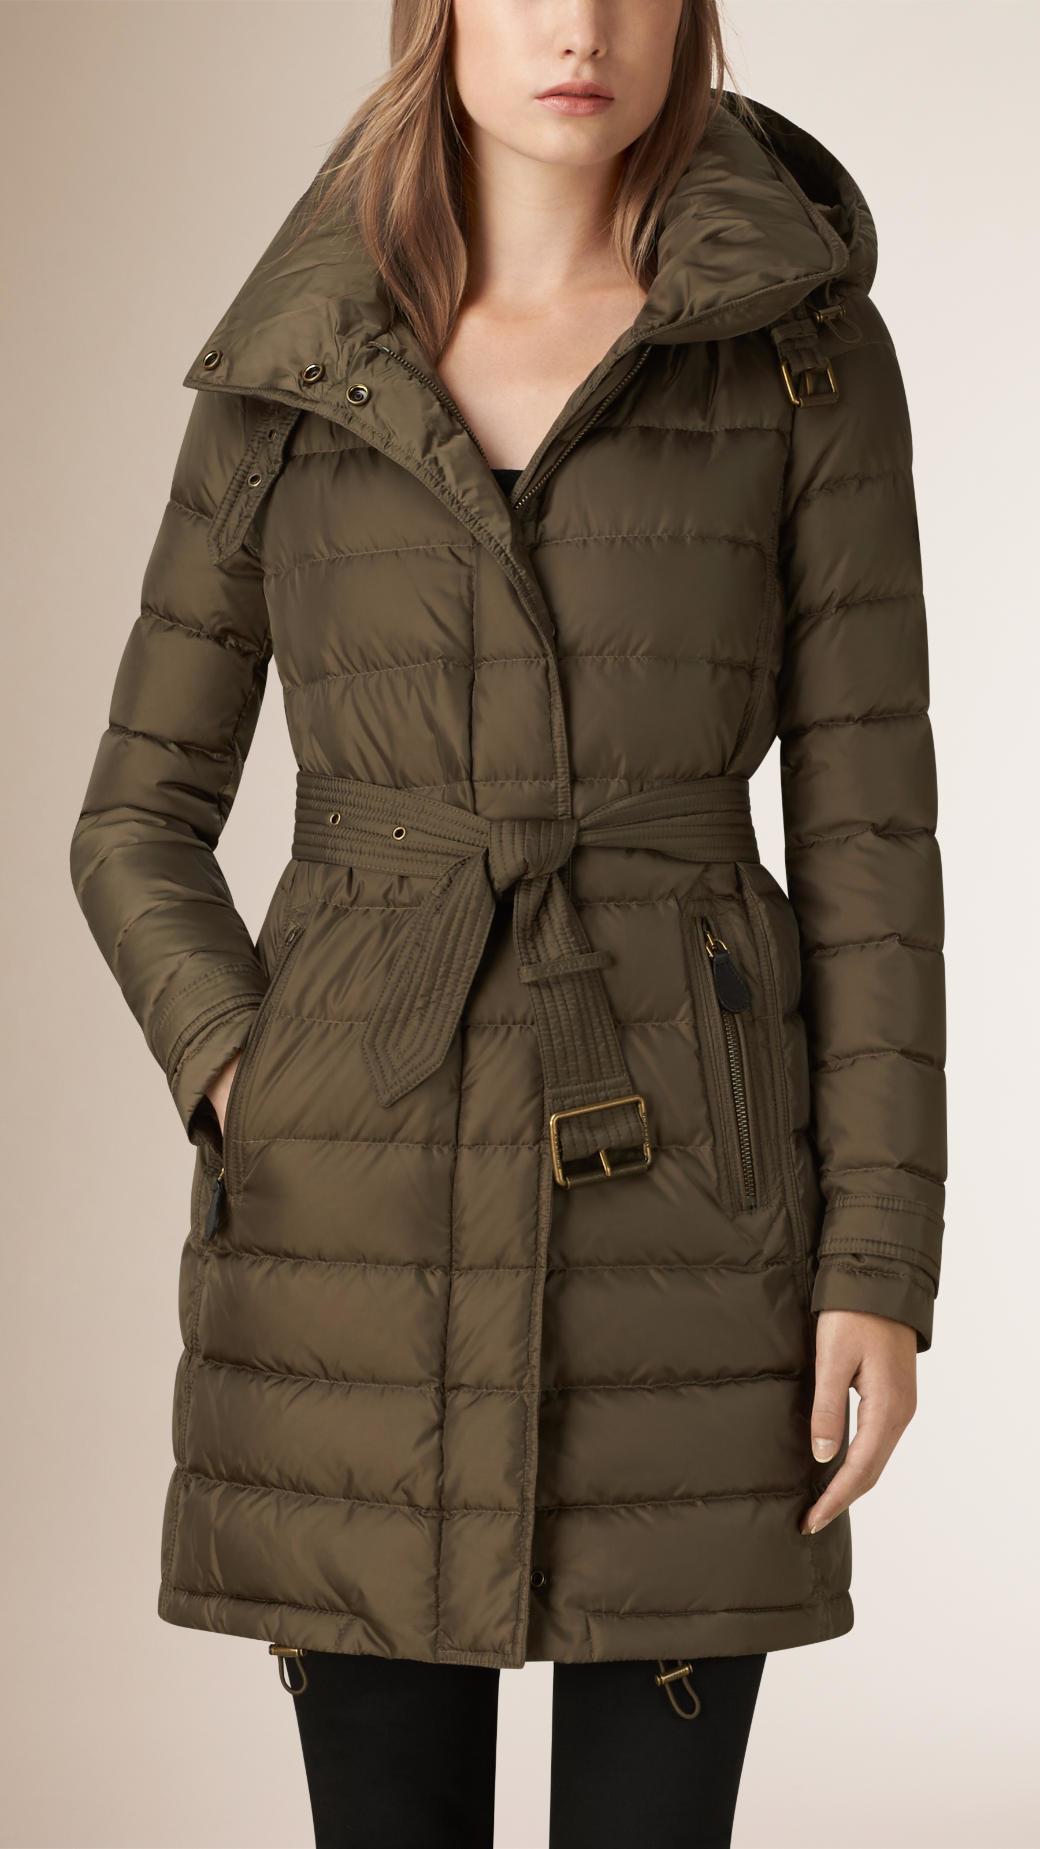 3698ec54e Burberry Down-filled Puffer Coat in Brown - Lyst